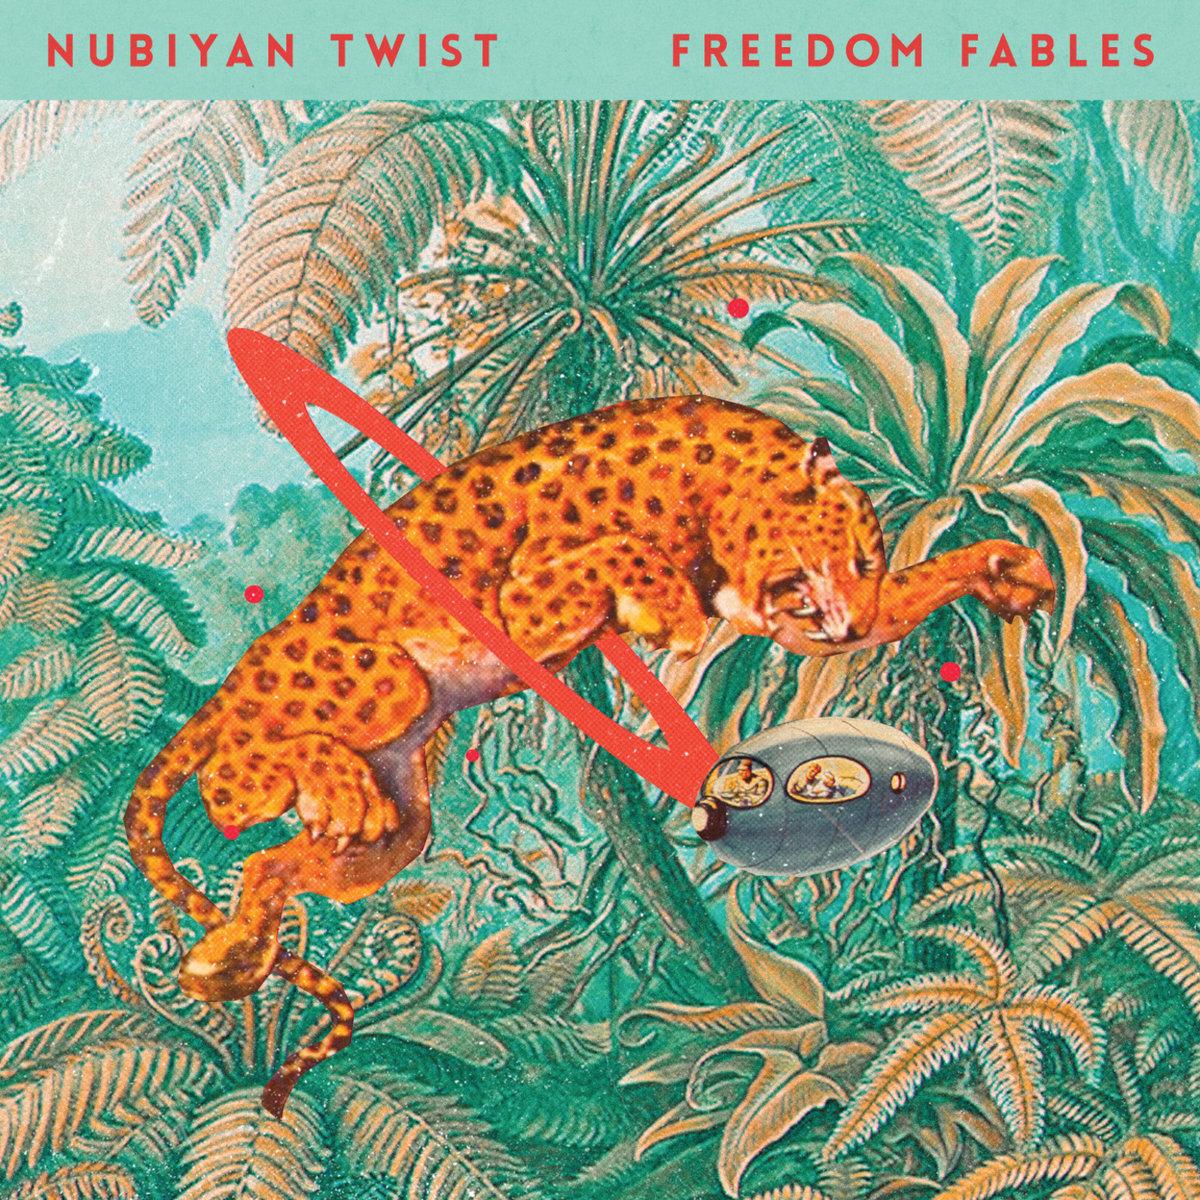 Nubiyan Twist feat. Ria Moran - Morning Light